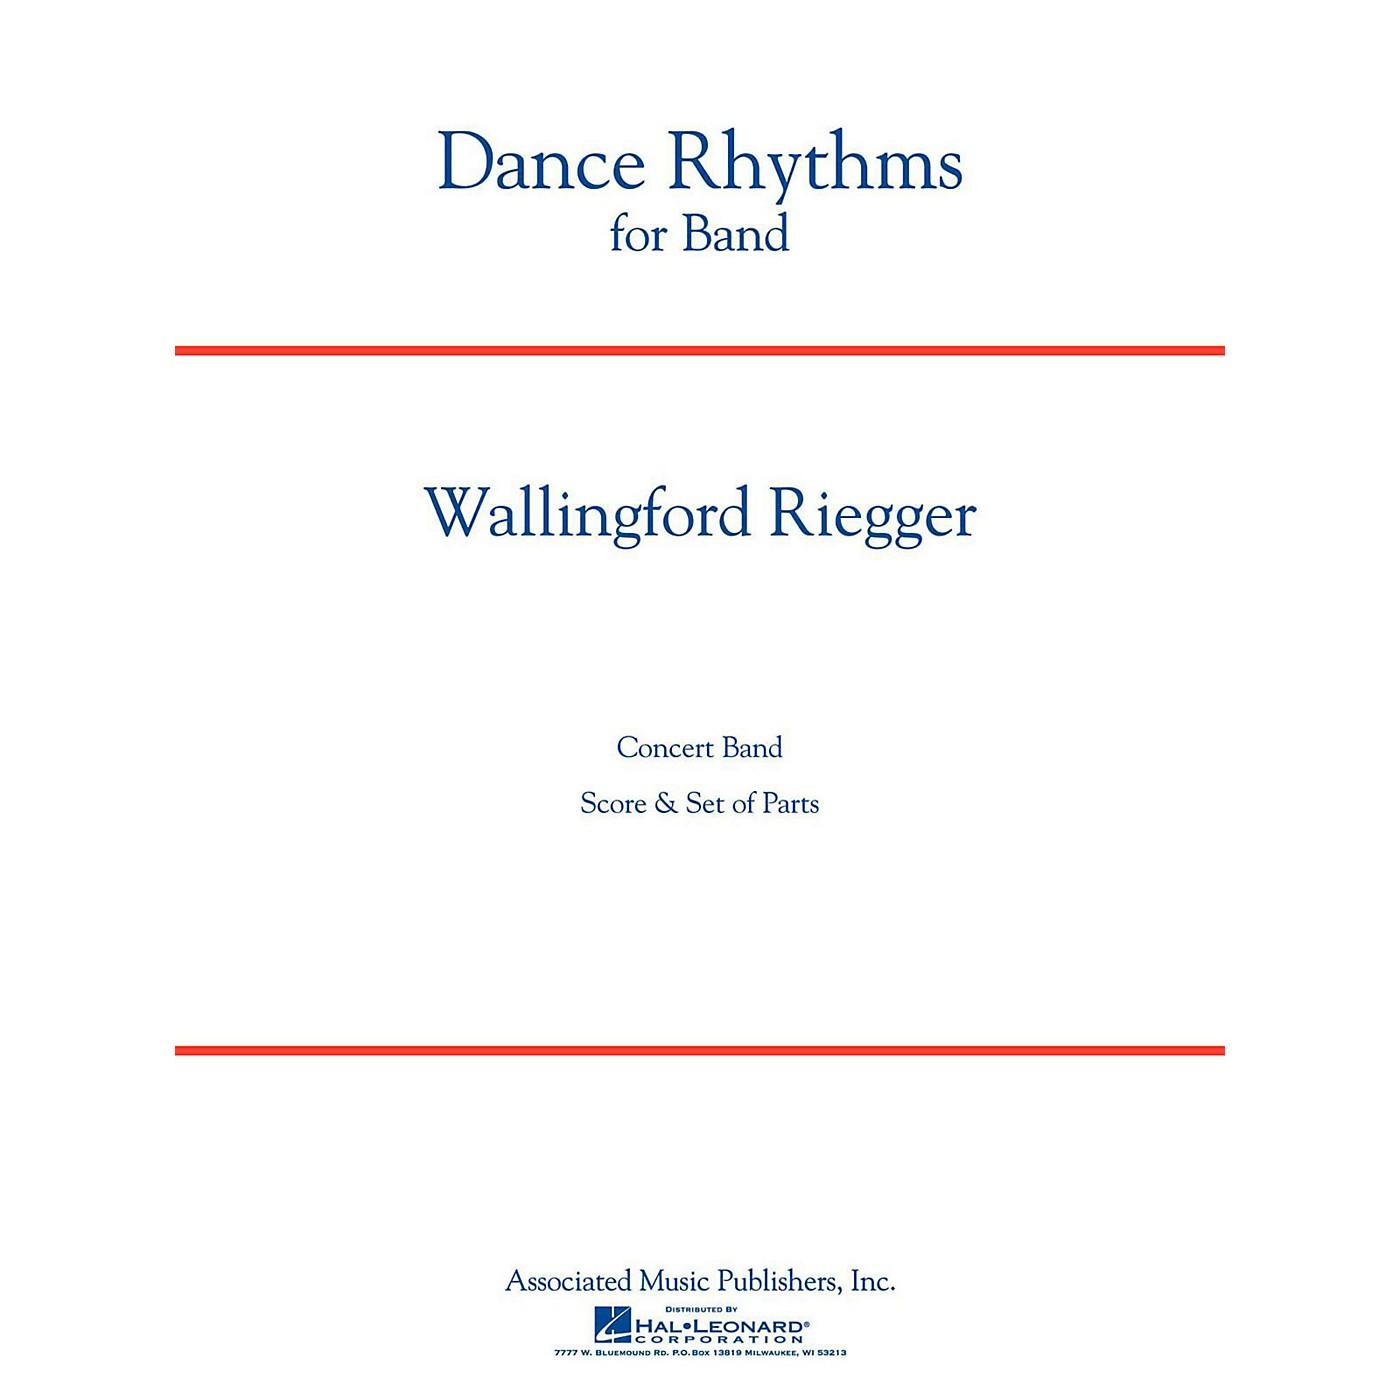 Hal Leonard Dance Rhythms For Band Op. 58 Level 5 thumbnail